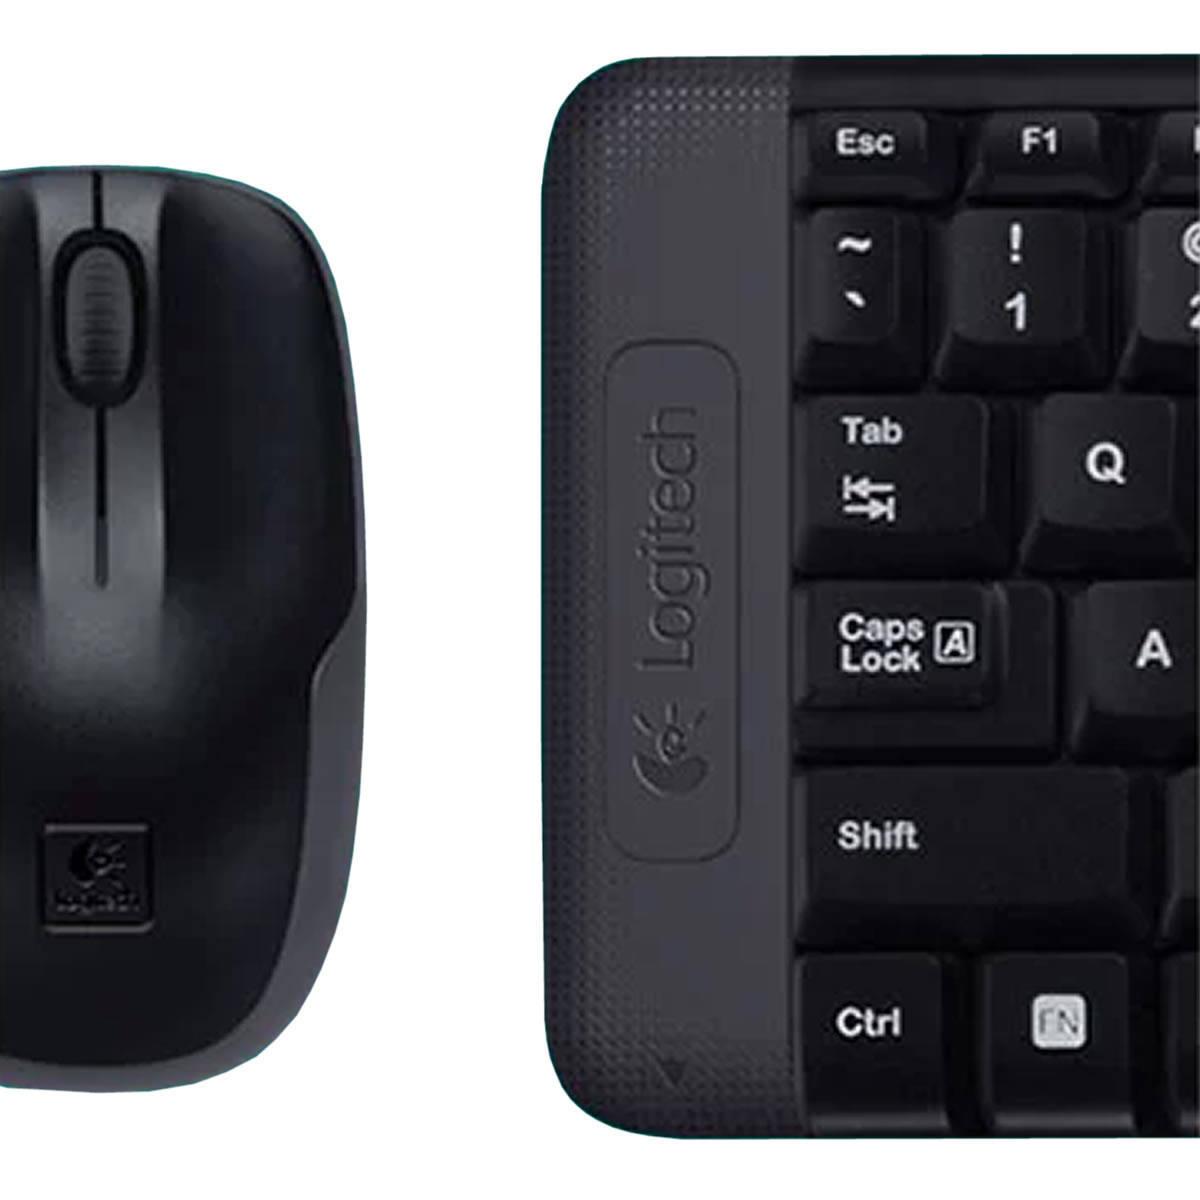 Combo Teclado e Mouse Sem Fio Logitech MK220 Design Minimalista ABNT2 Pilhas Inclusas 920-004431